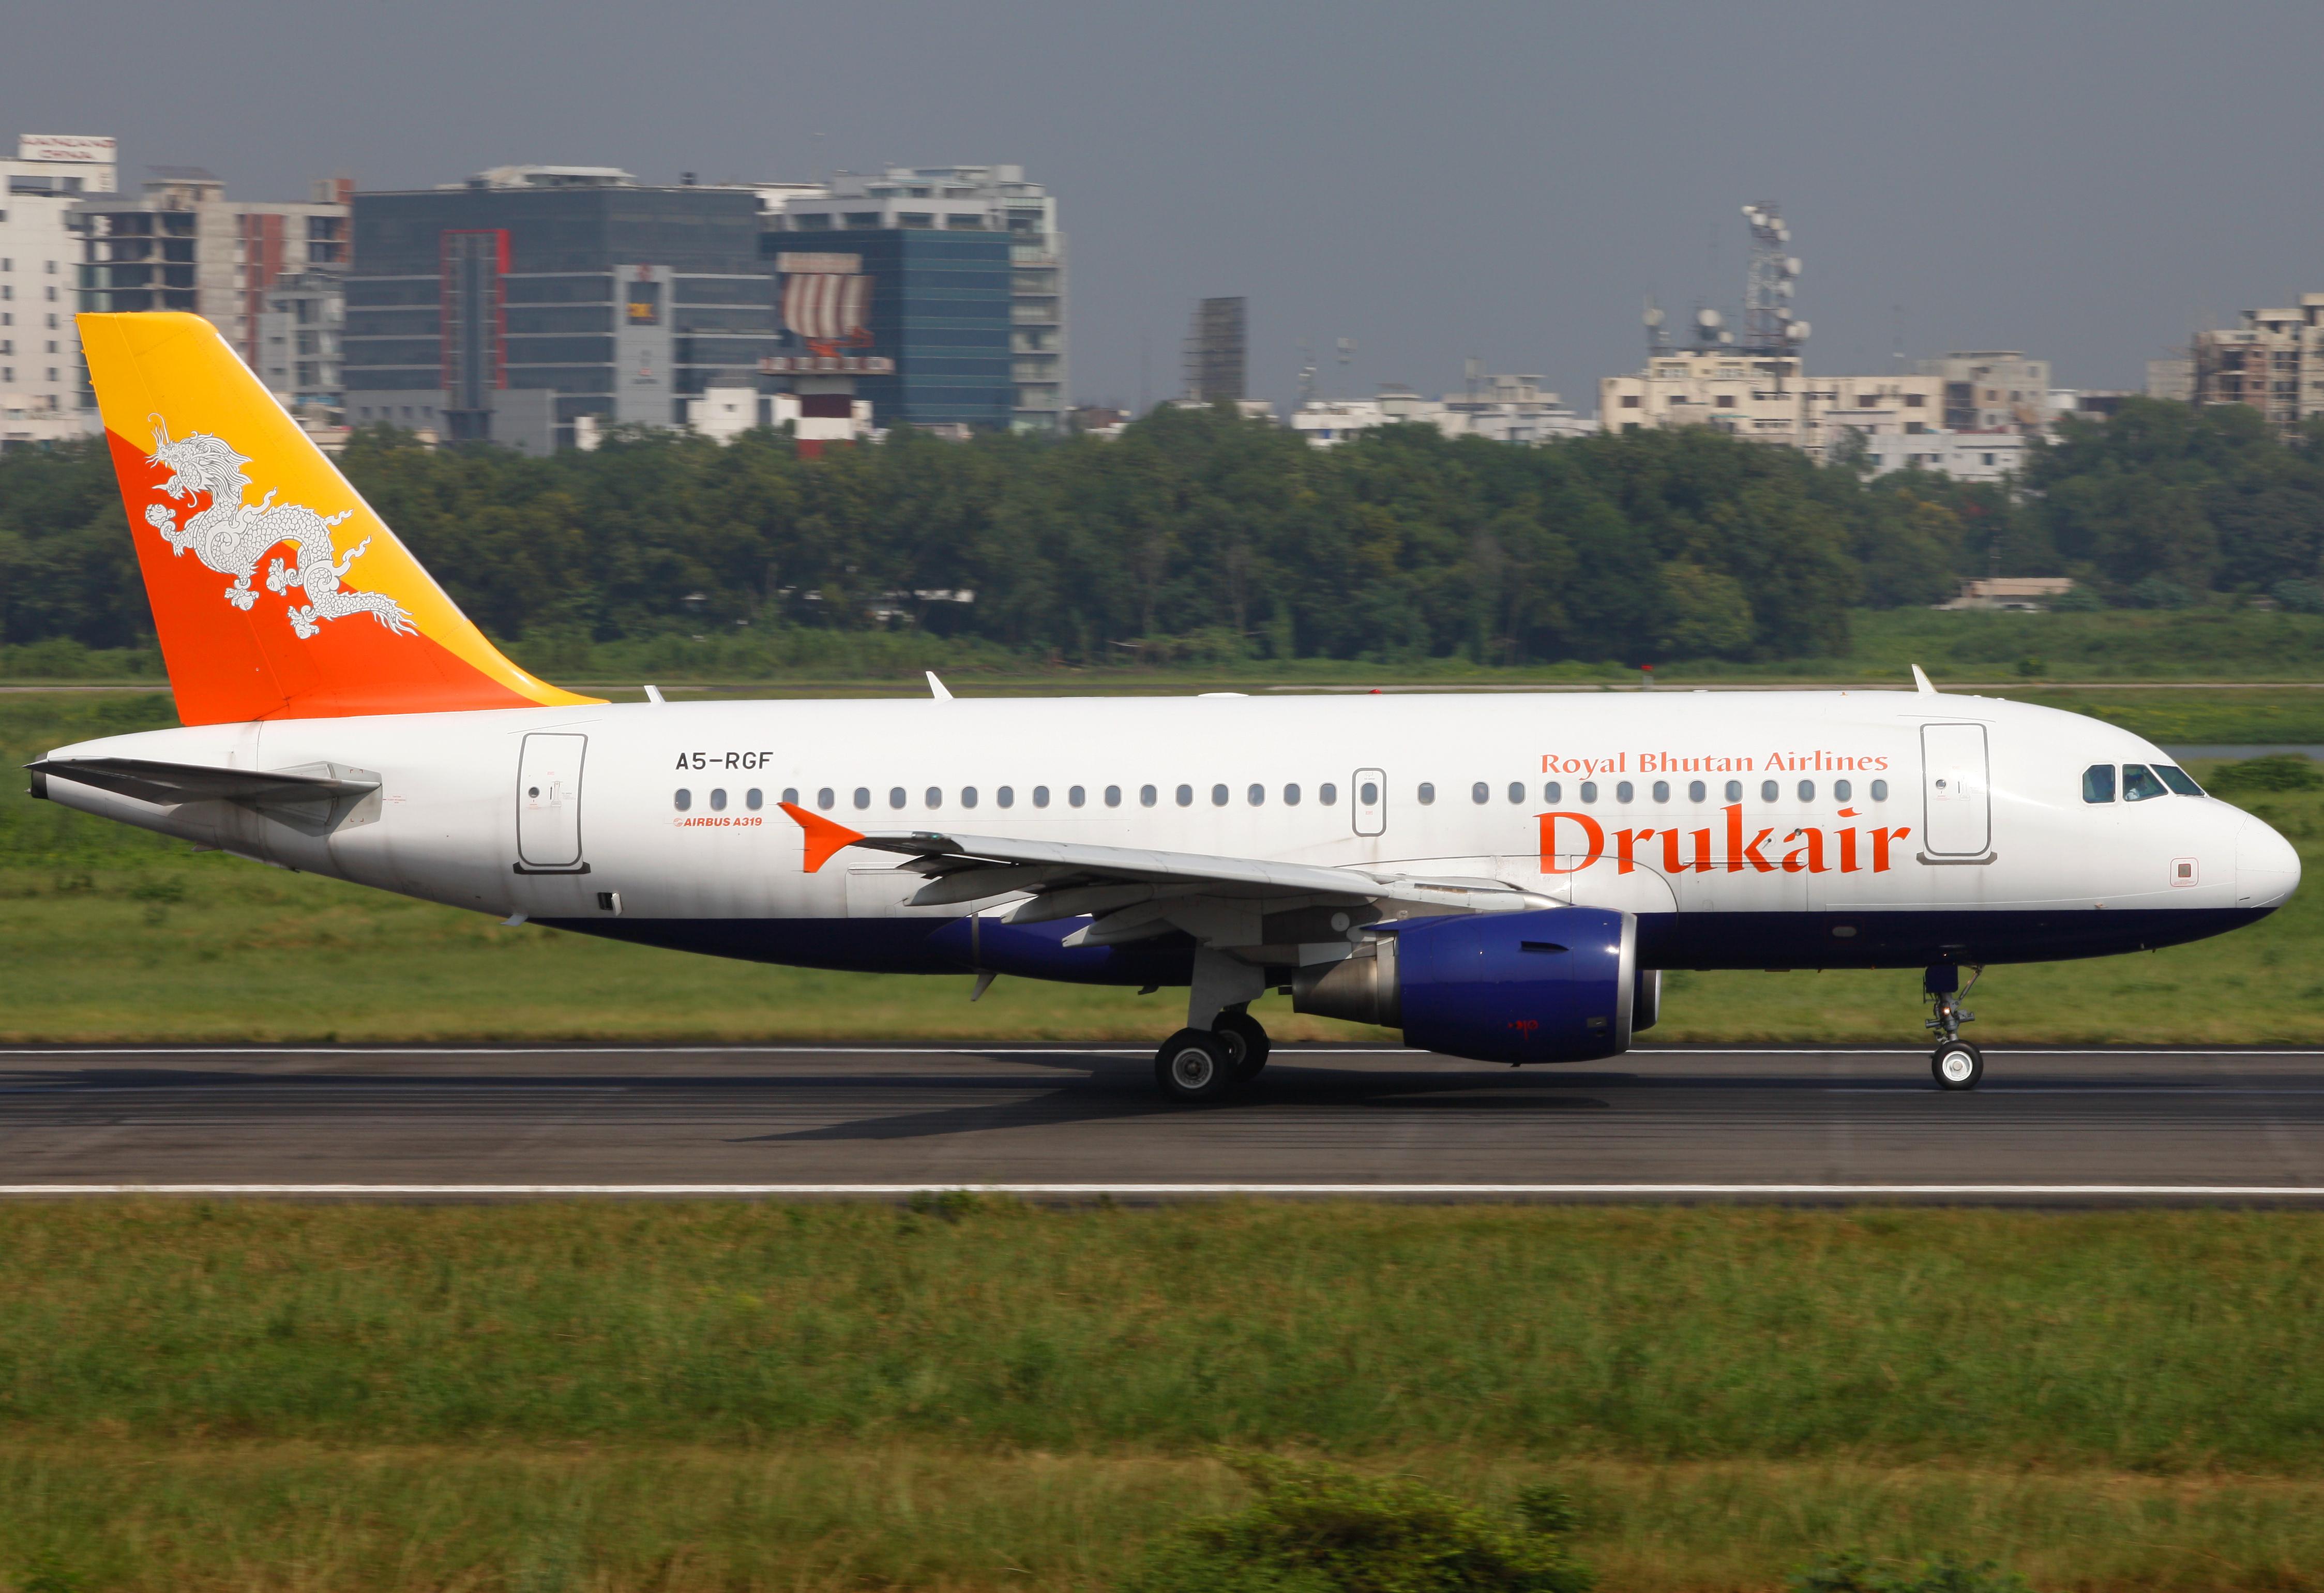 Filea5 Rgf Airbus A319 115 Druk Air Royal Bhutan Airlines Running